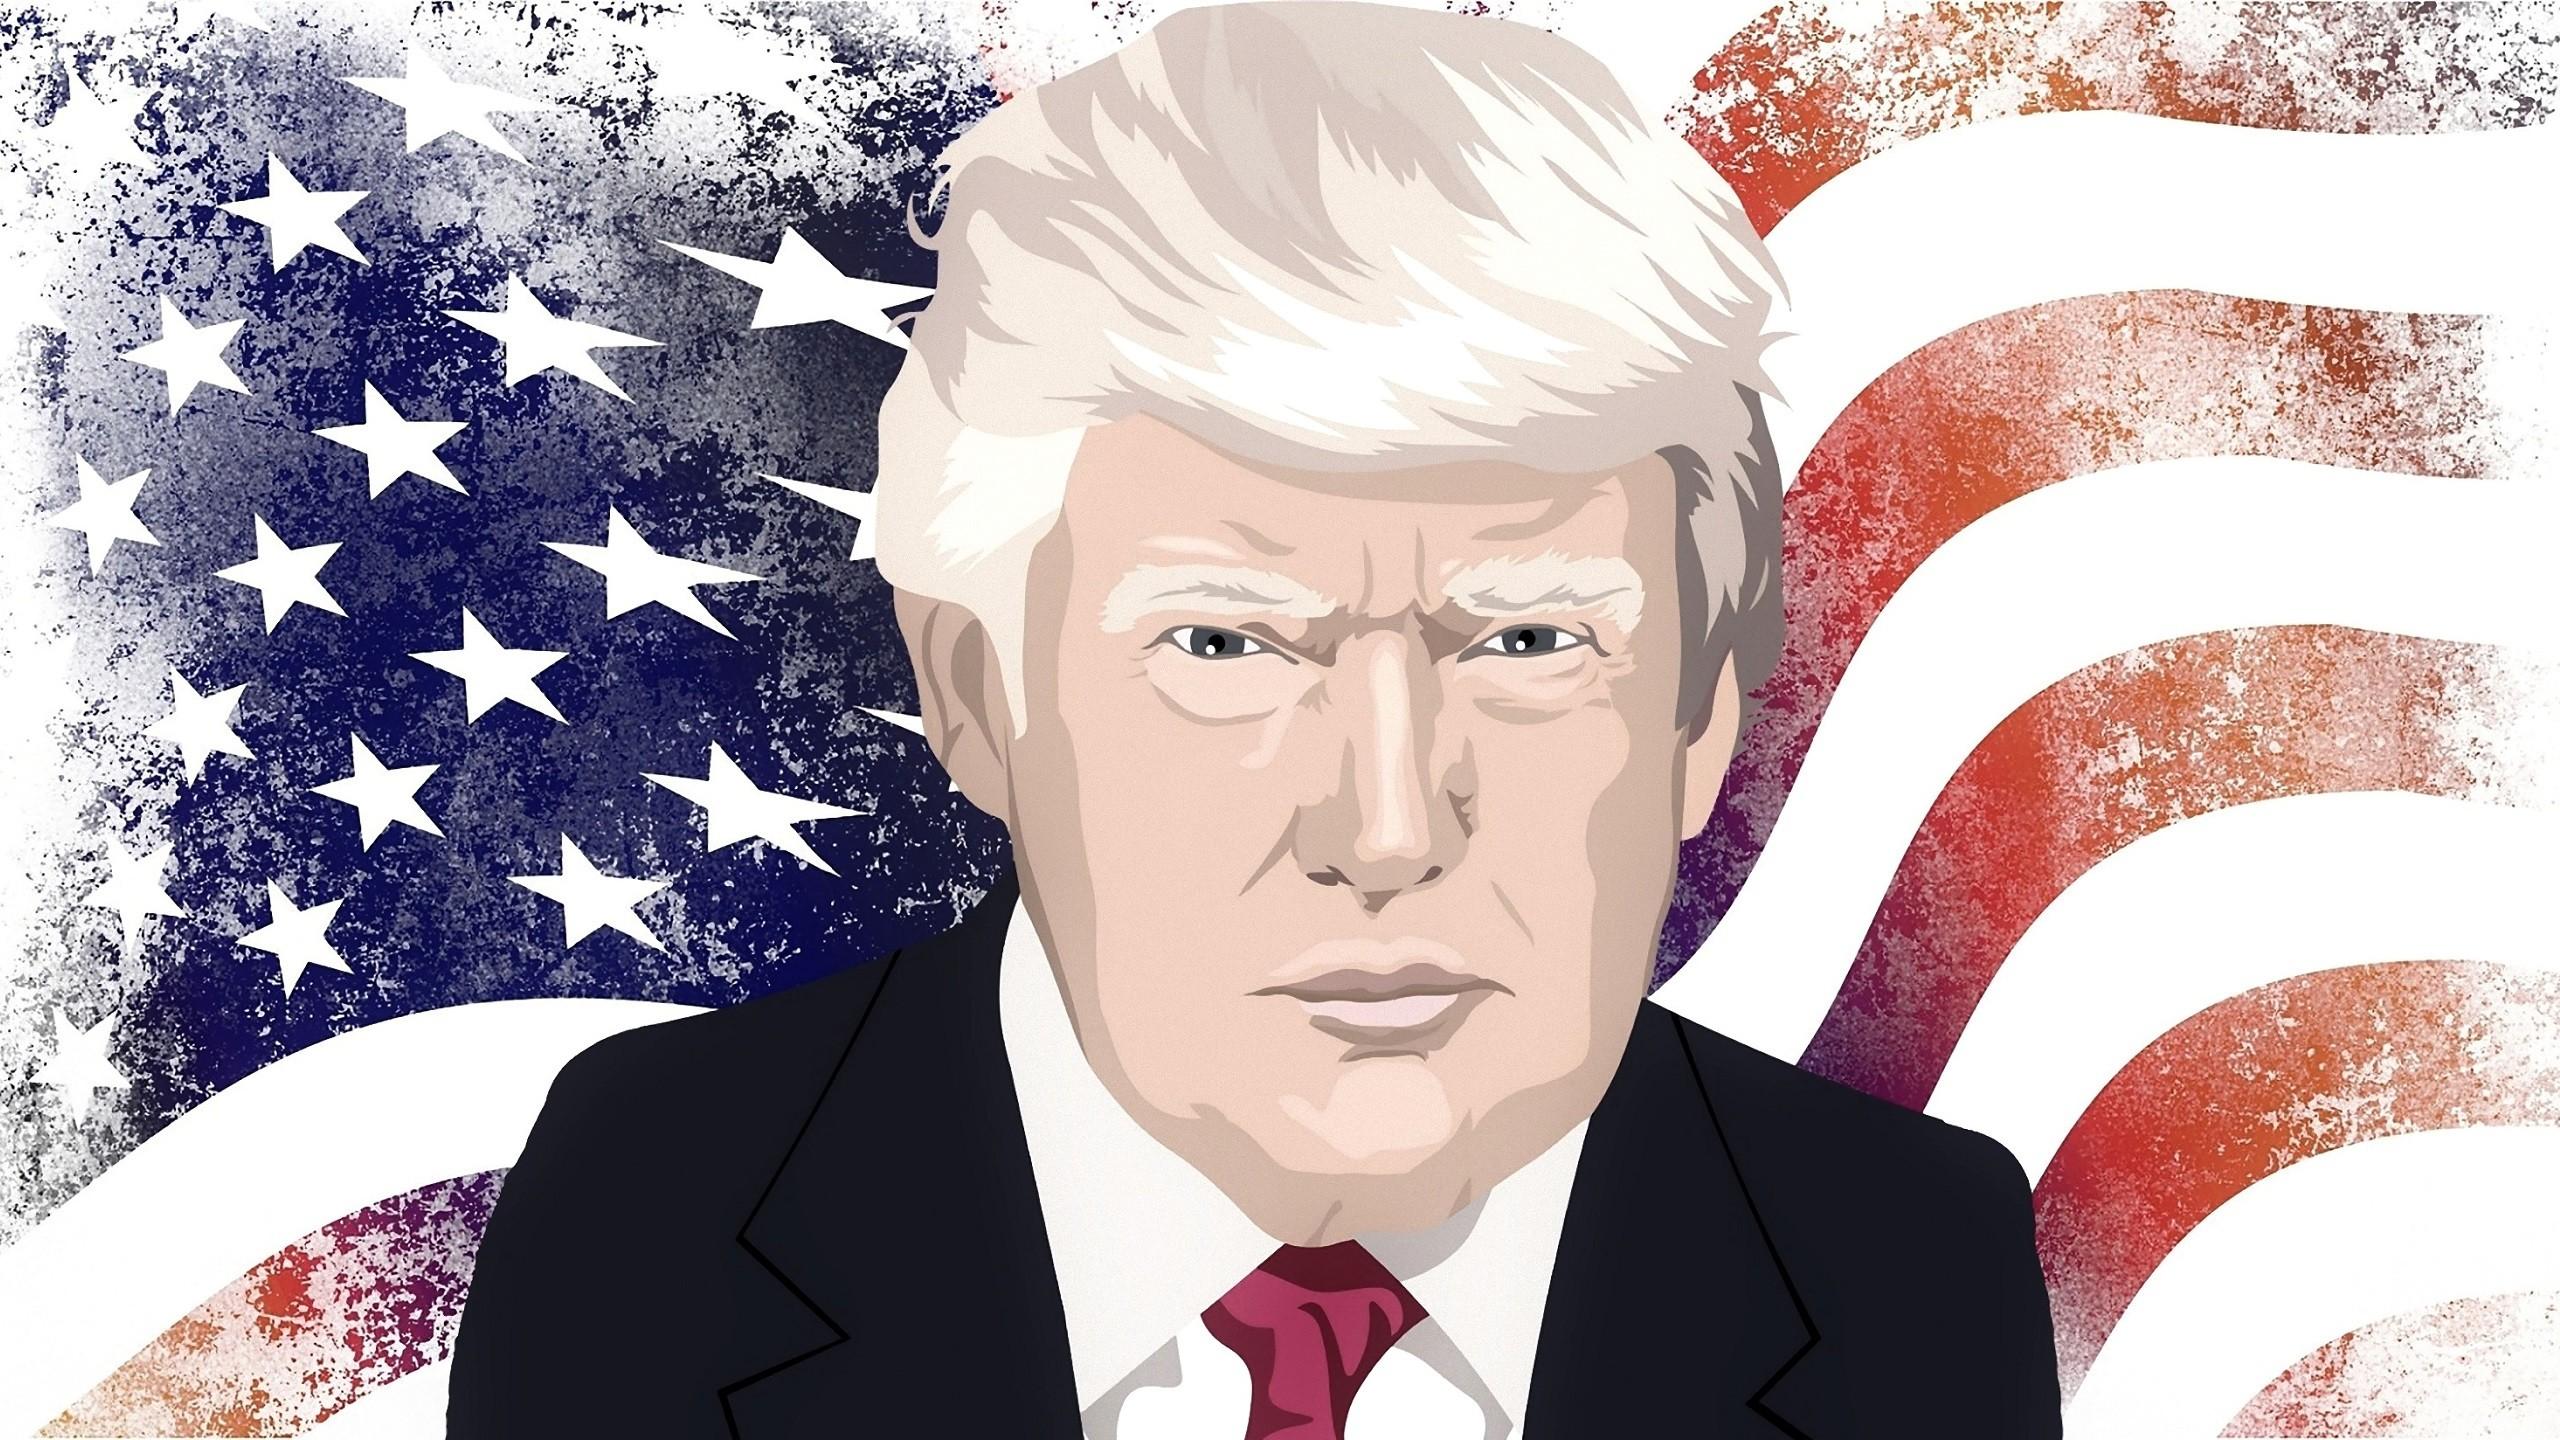 Donald Trump Wallpapers Barbaras Hd Wallpapers